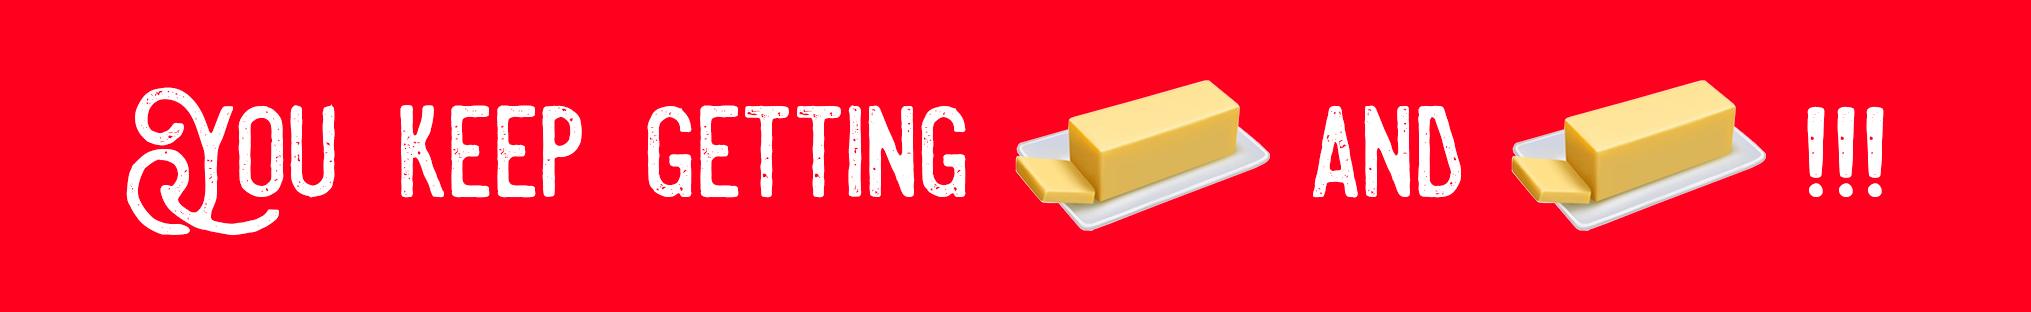 You Keep Getting (Butter Emoji) And (Butter Emoji)